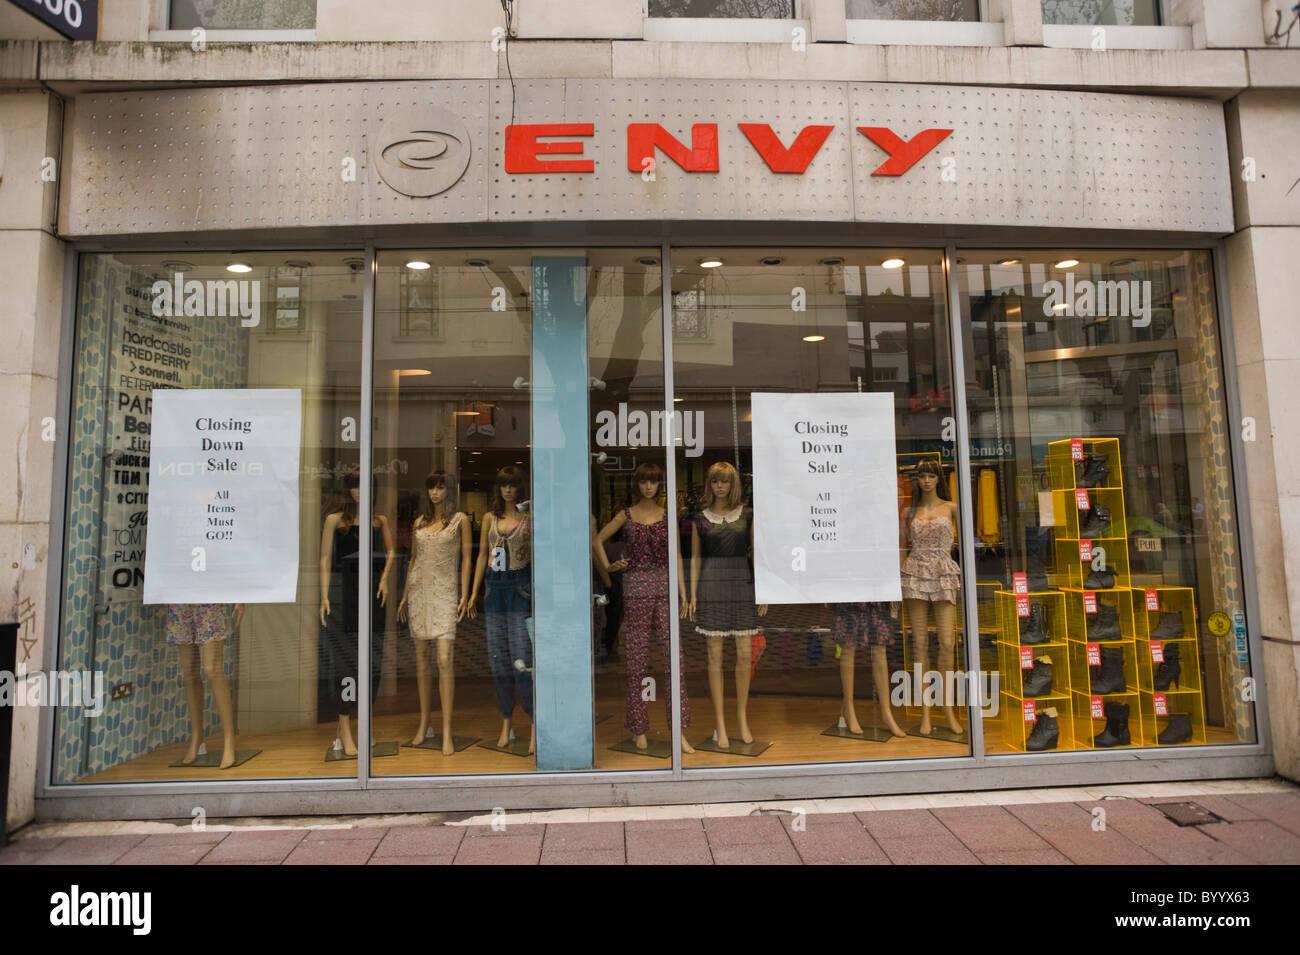 Envy u clothing store